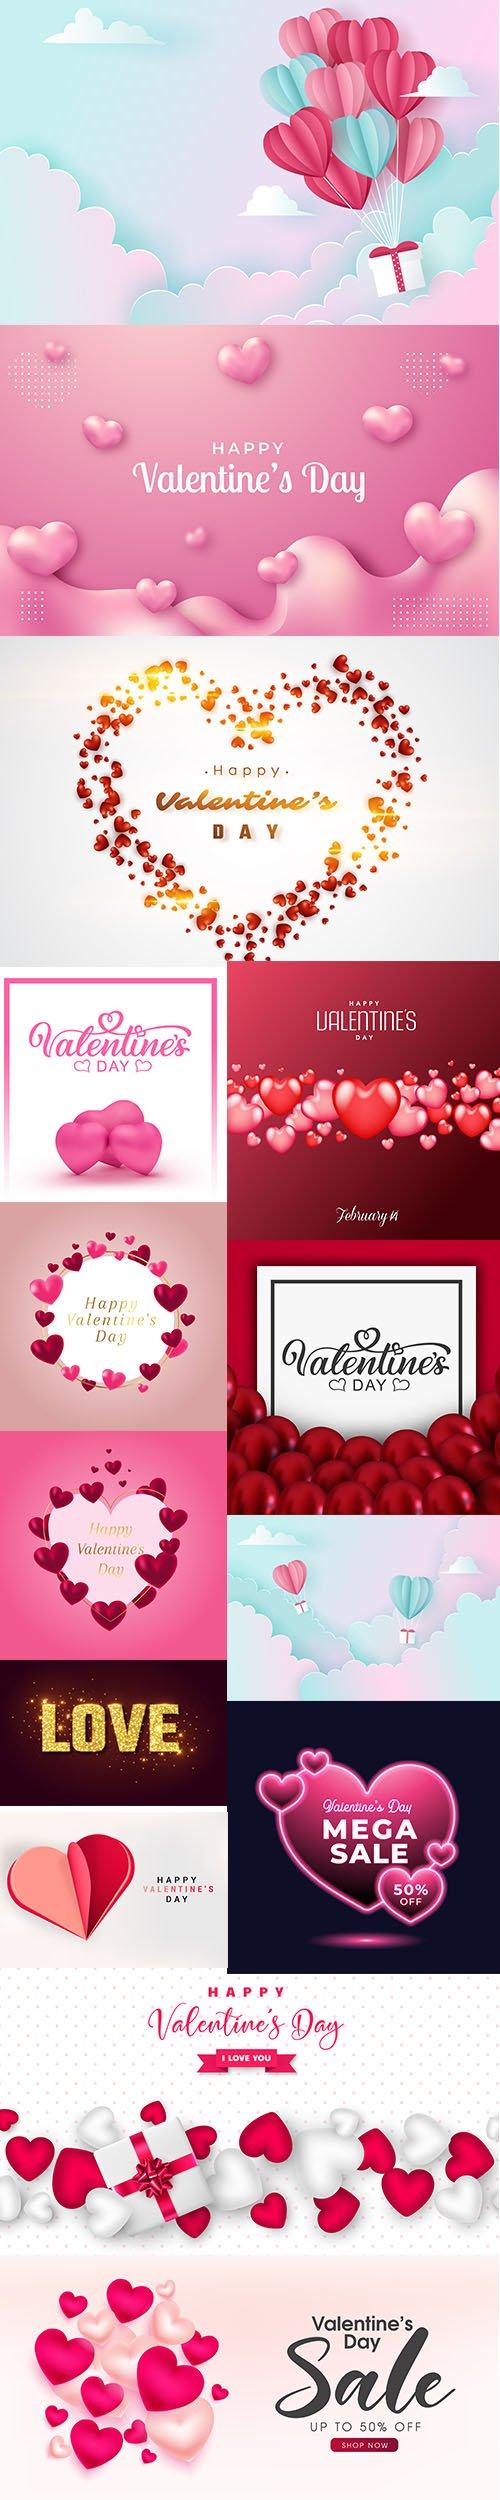 Set of Romantic Valentines Day Illustrations